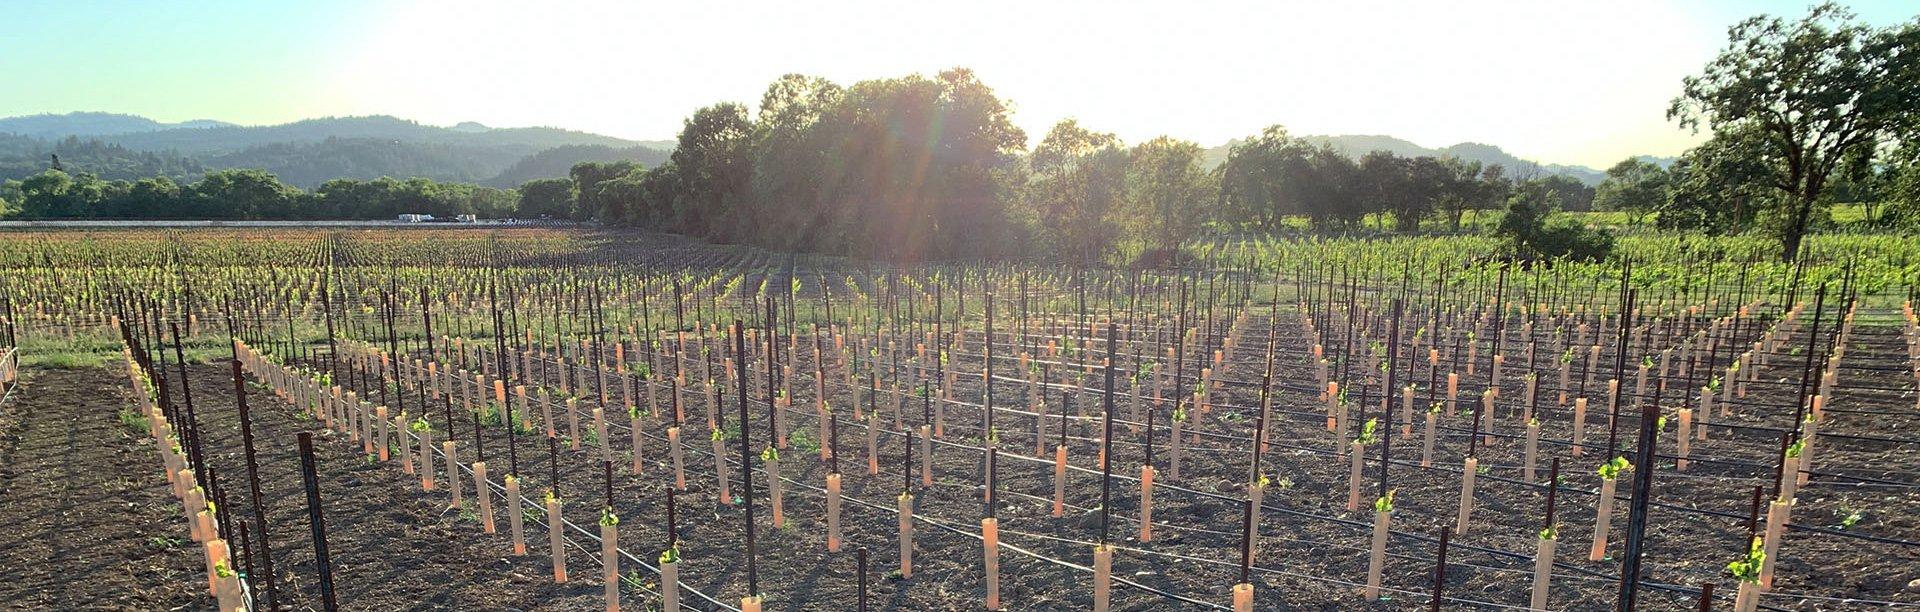 Sunshine in Sonoma County Vineyards